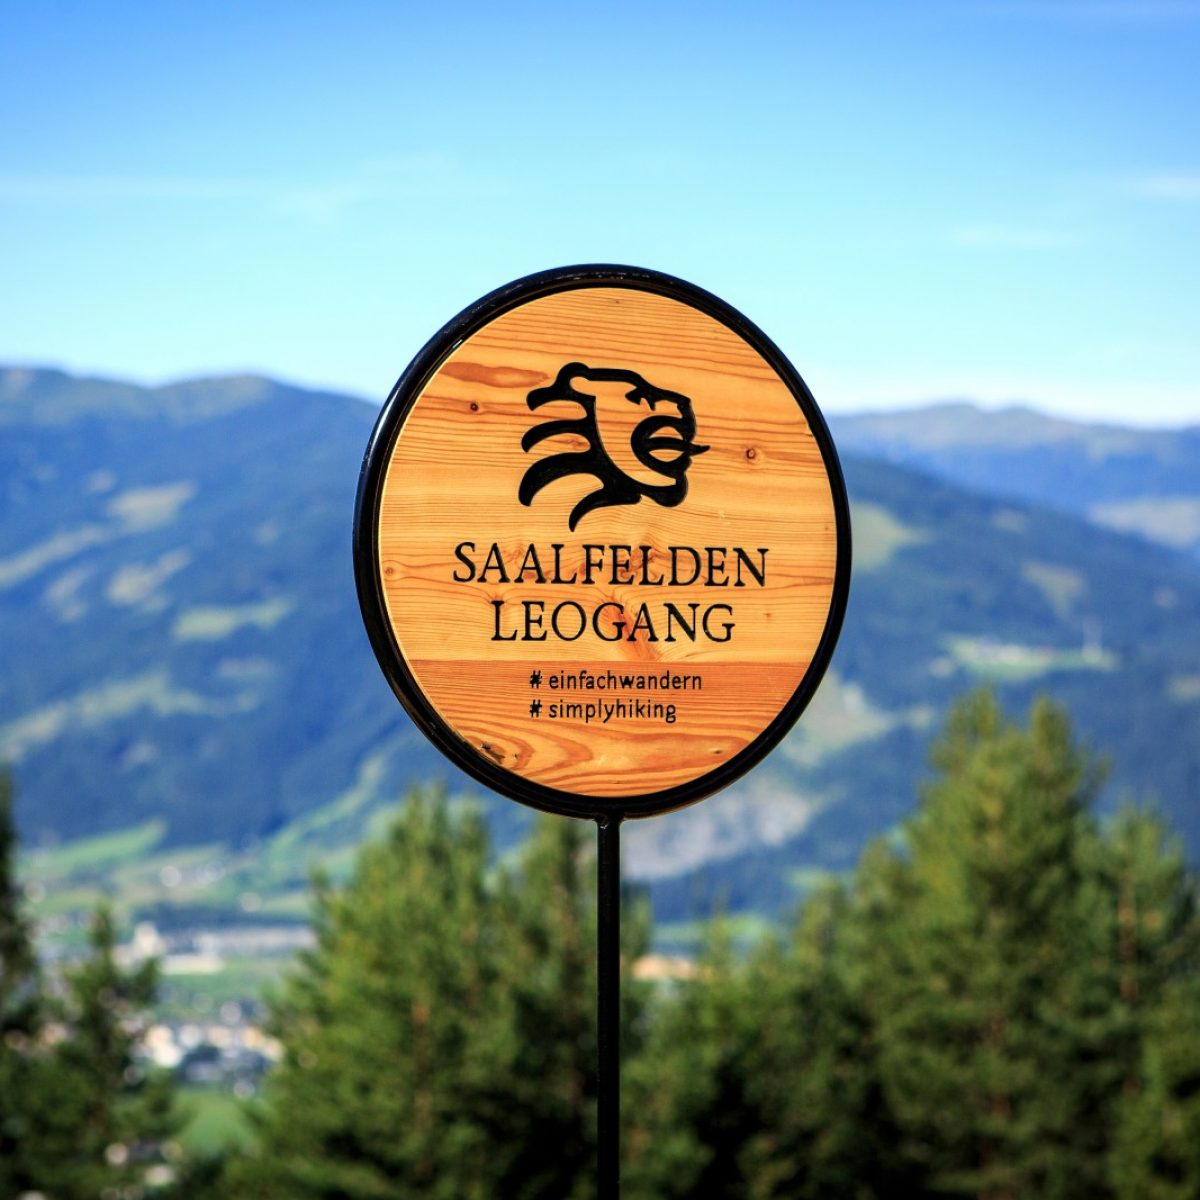 Kontrastreiches Saalfelden Leogang - Saalfelden am